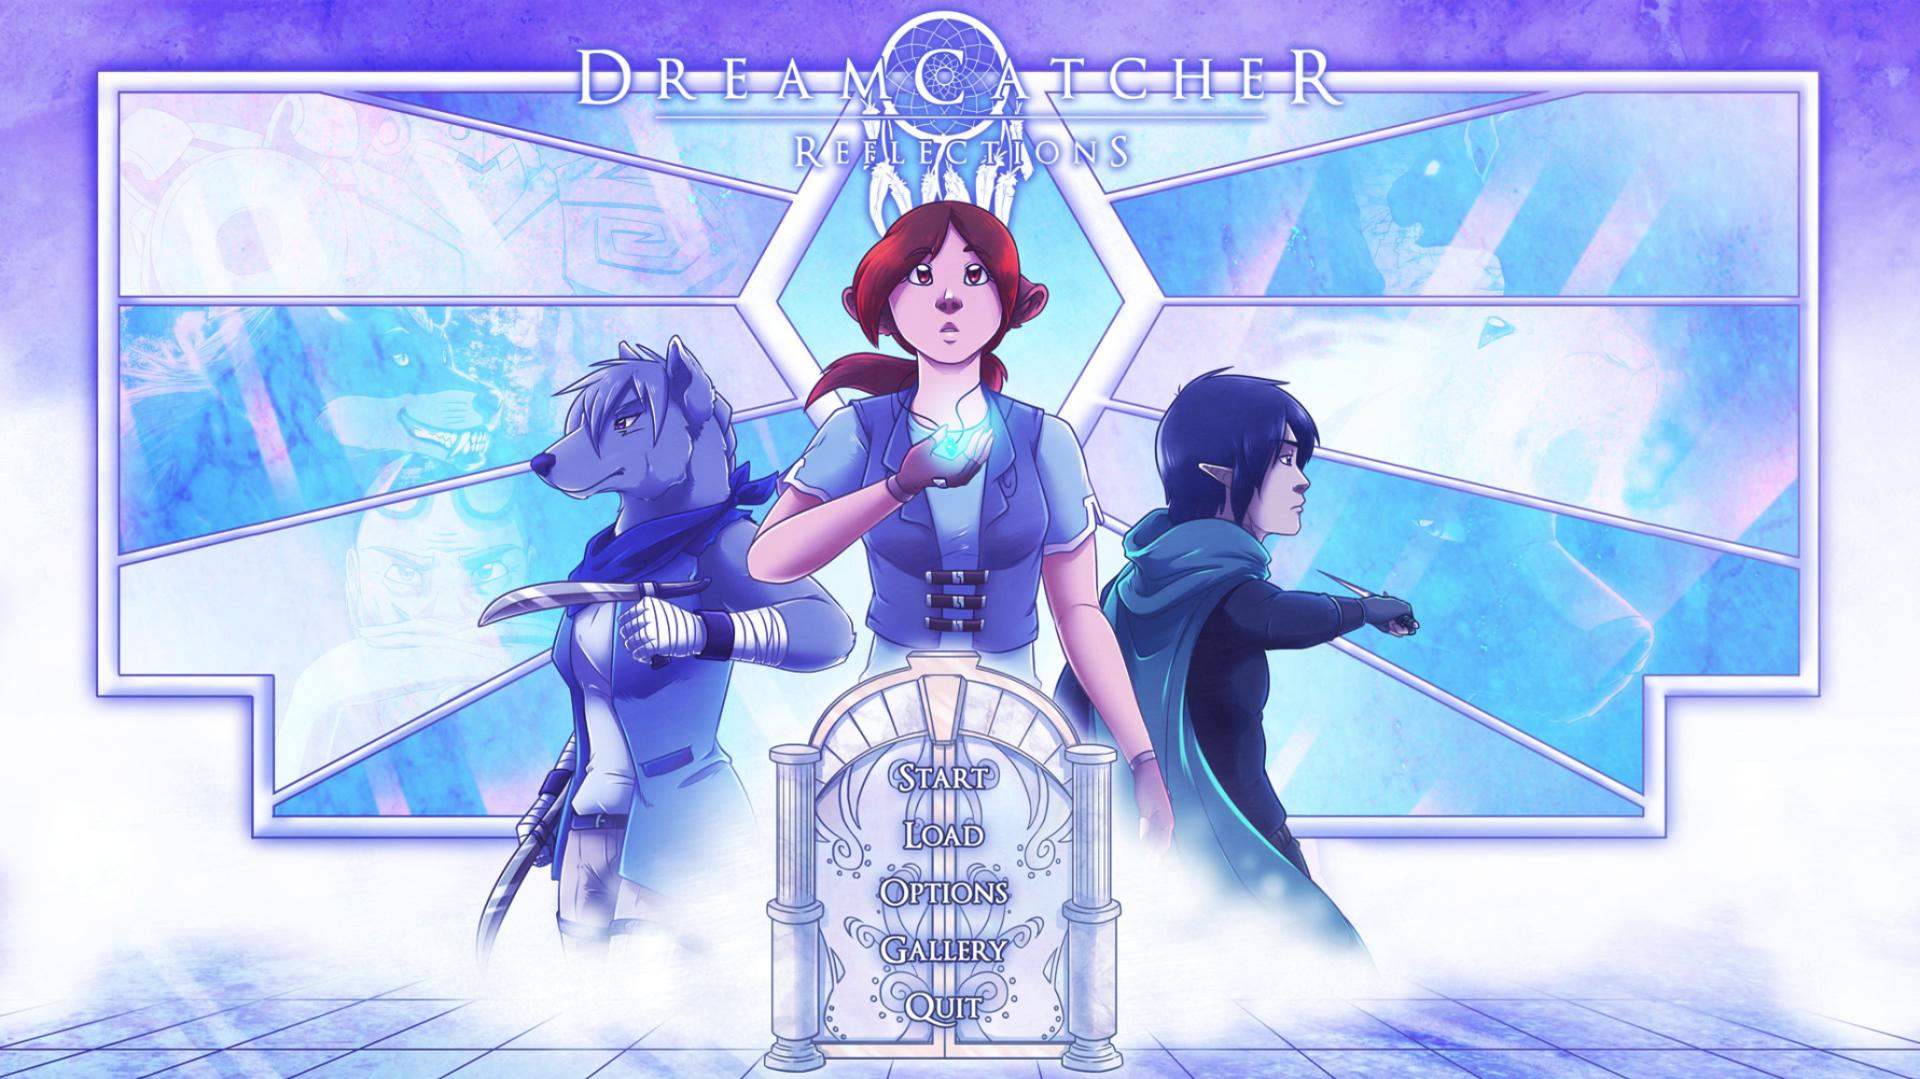 DreamCatcher: Reflections, Volume 1